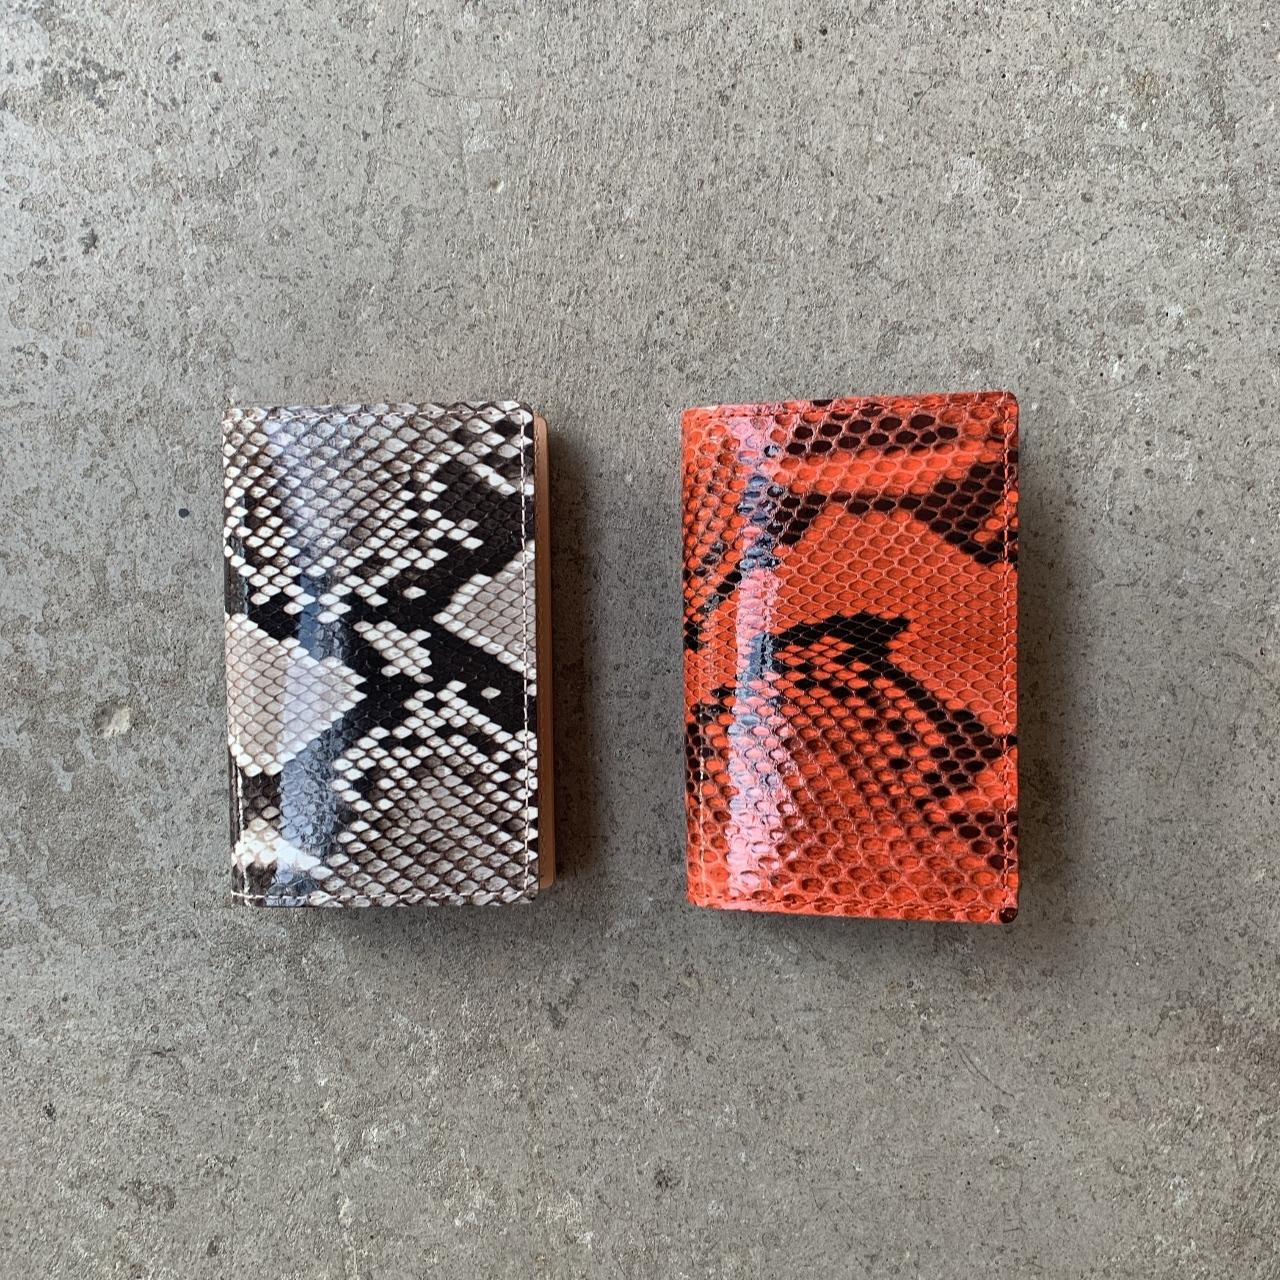 Hender Scheme - python folded card case